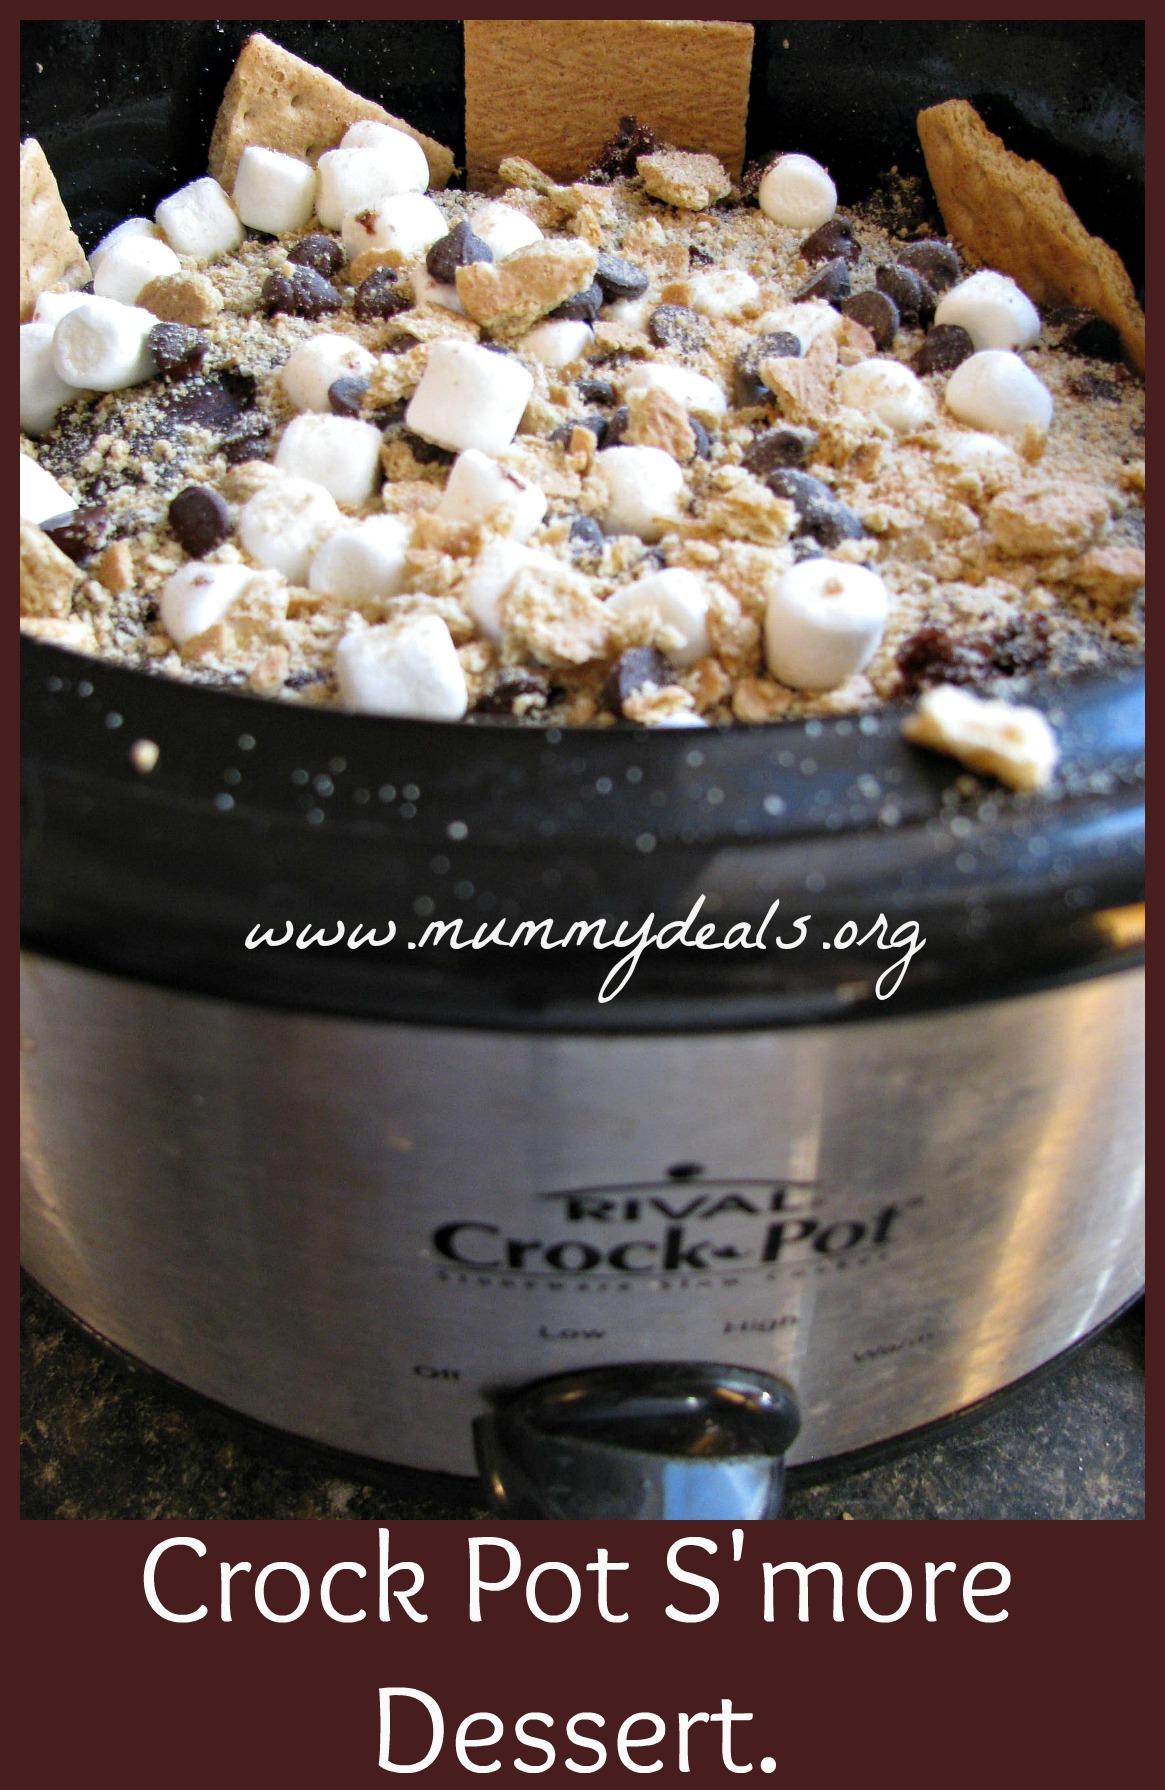 Crock Pot S'more Dessert